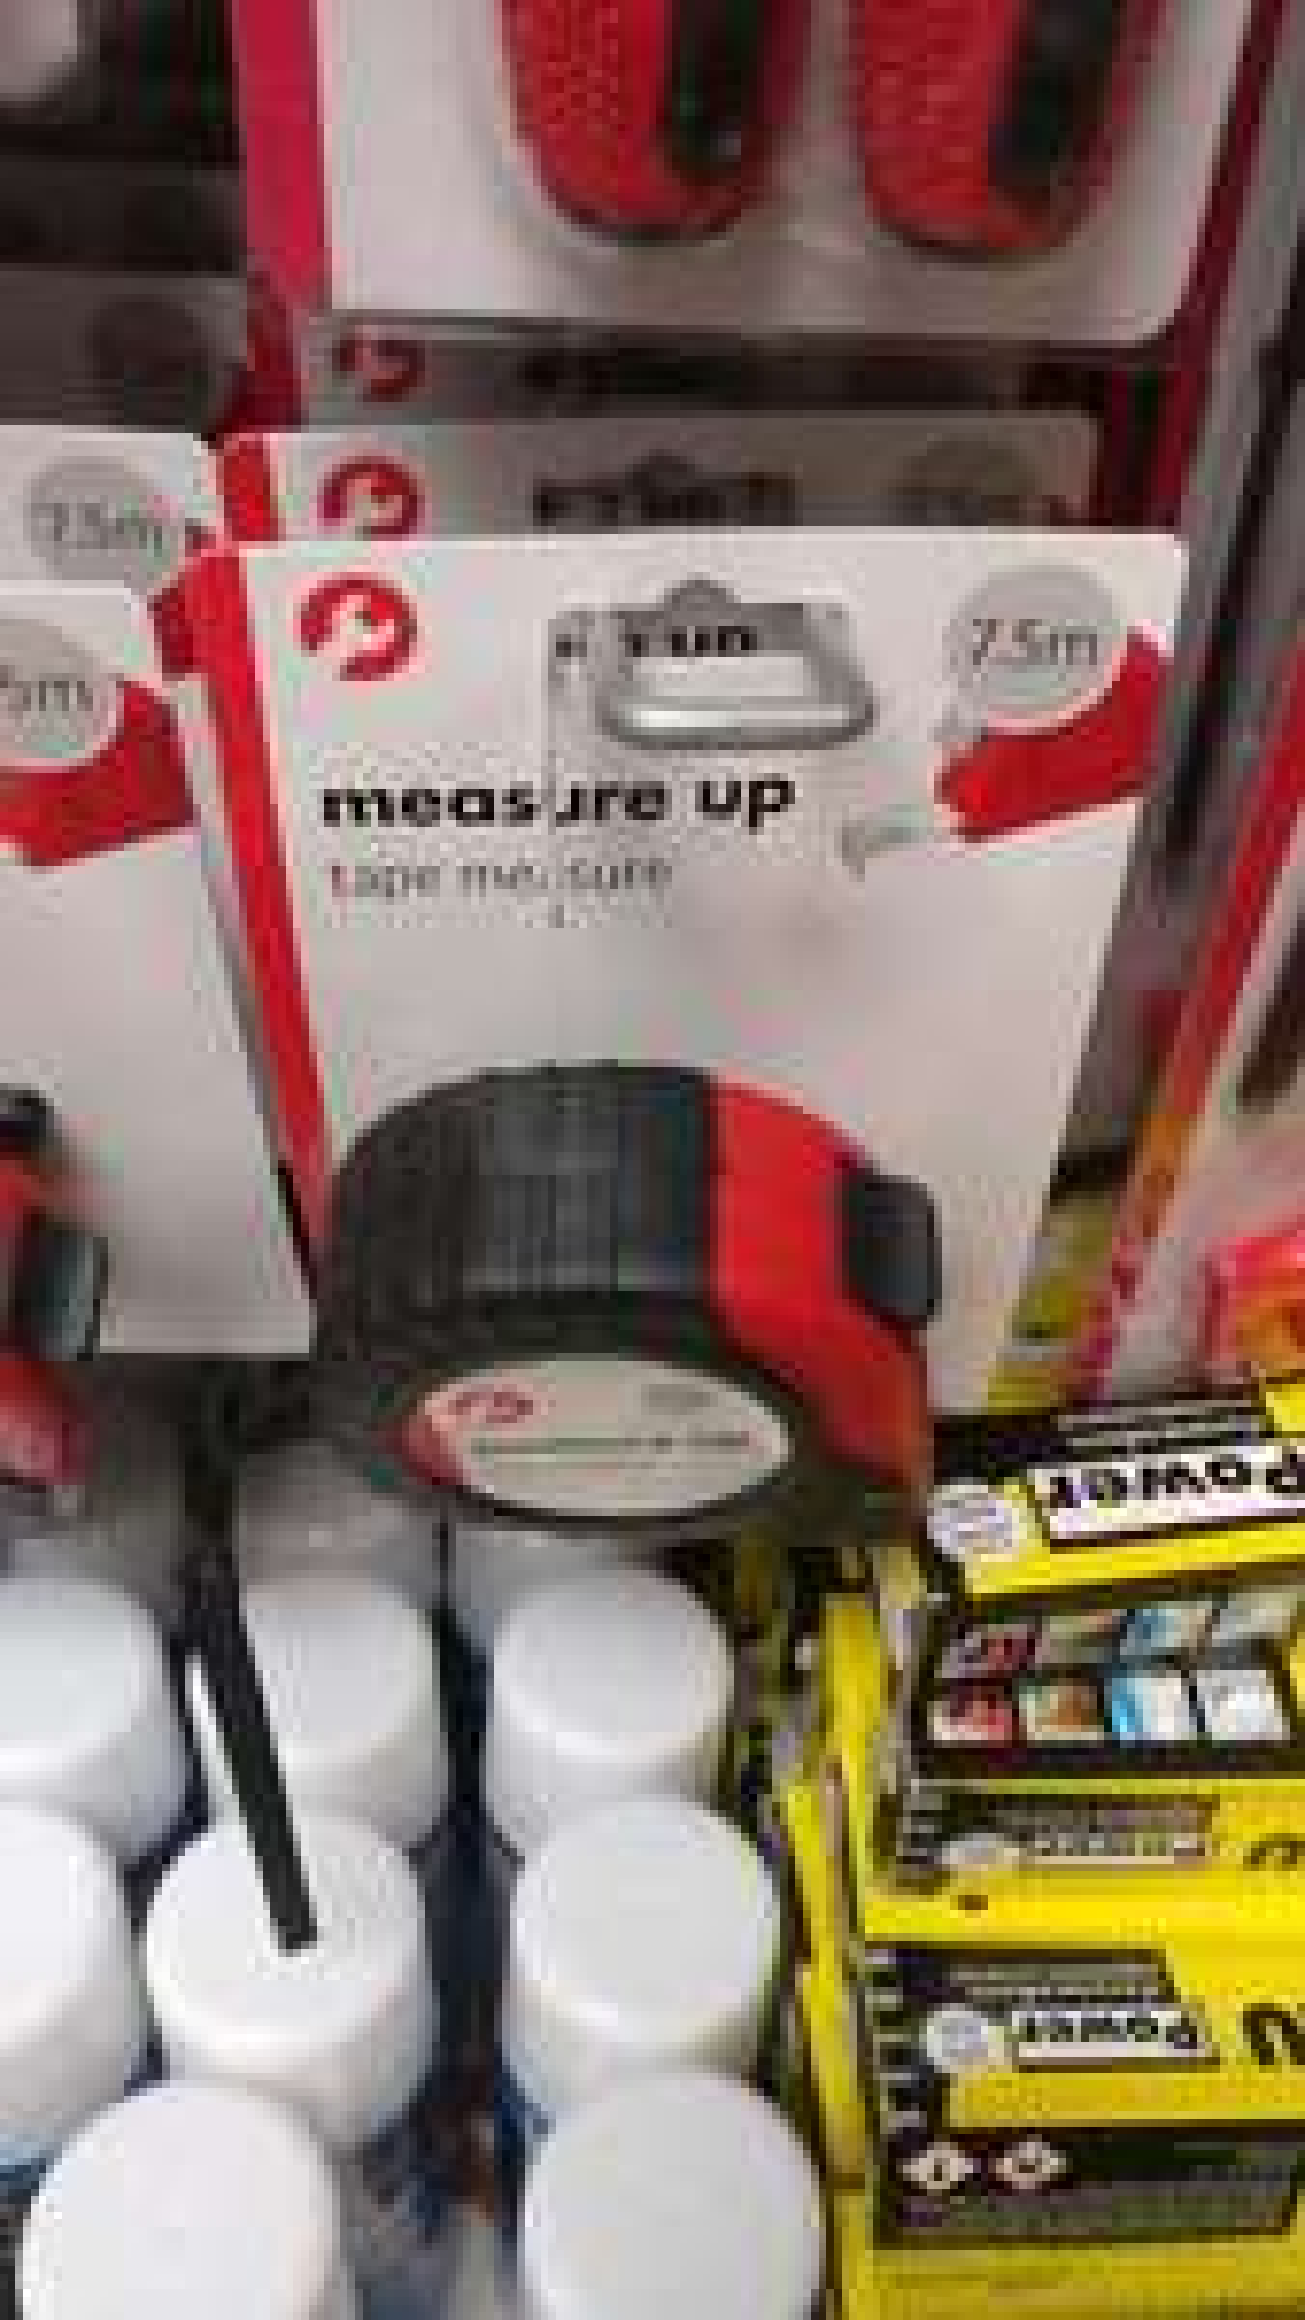 Measure tape 7.5 m £1 @ poundland